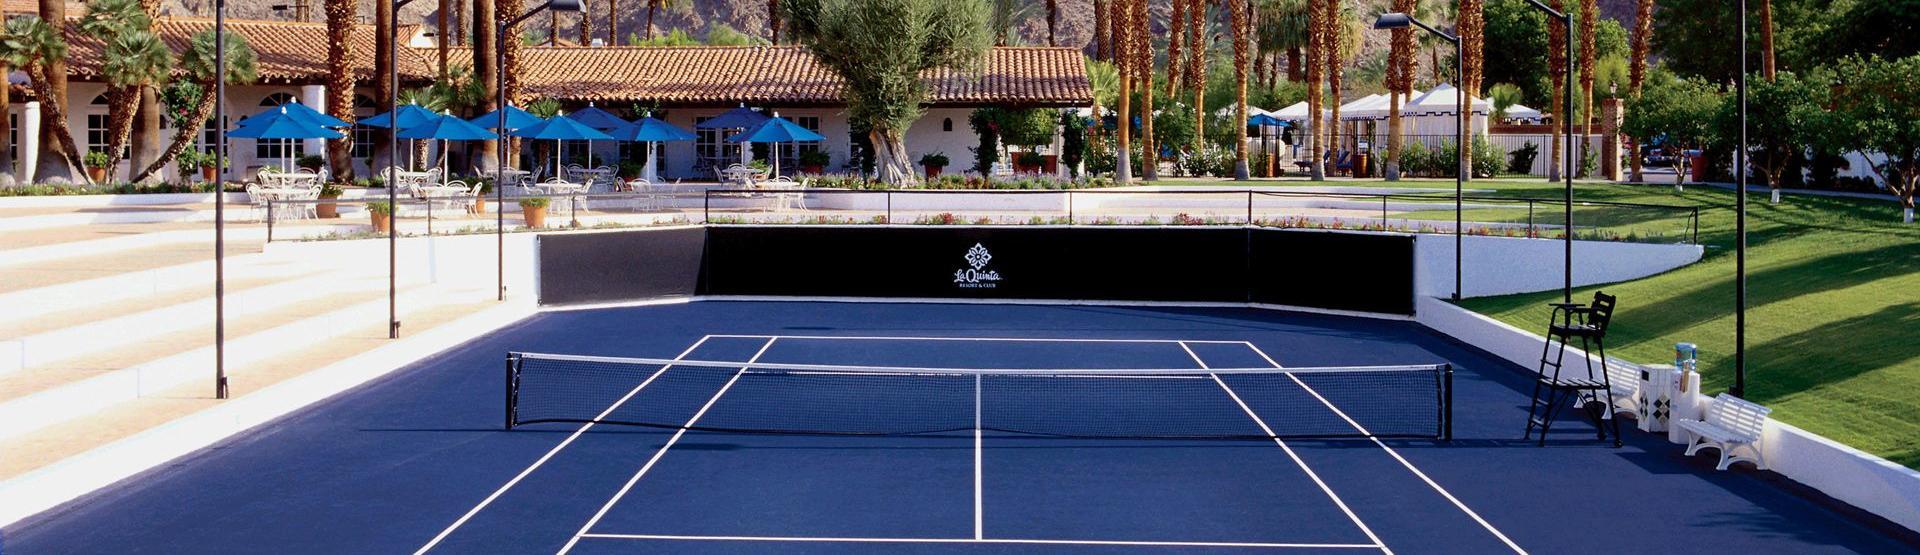 tennis-center-court-1920x611__hero.jpg